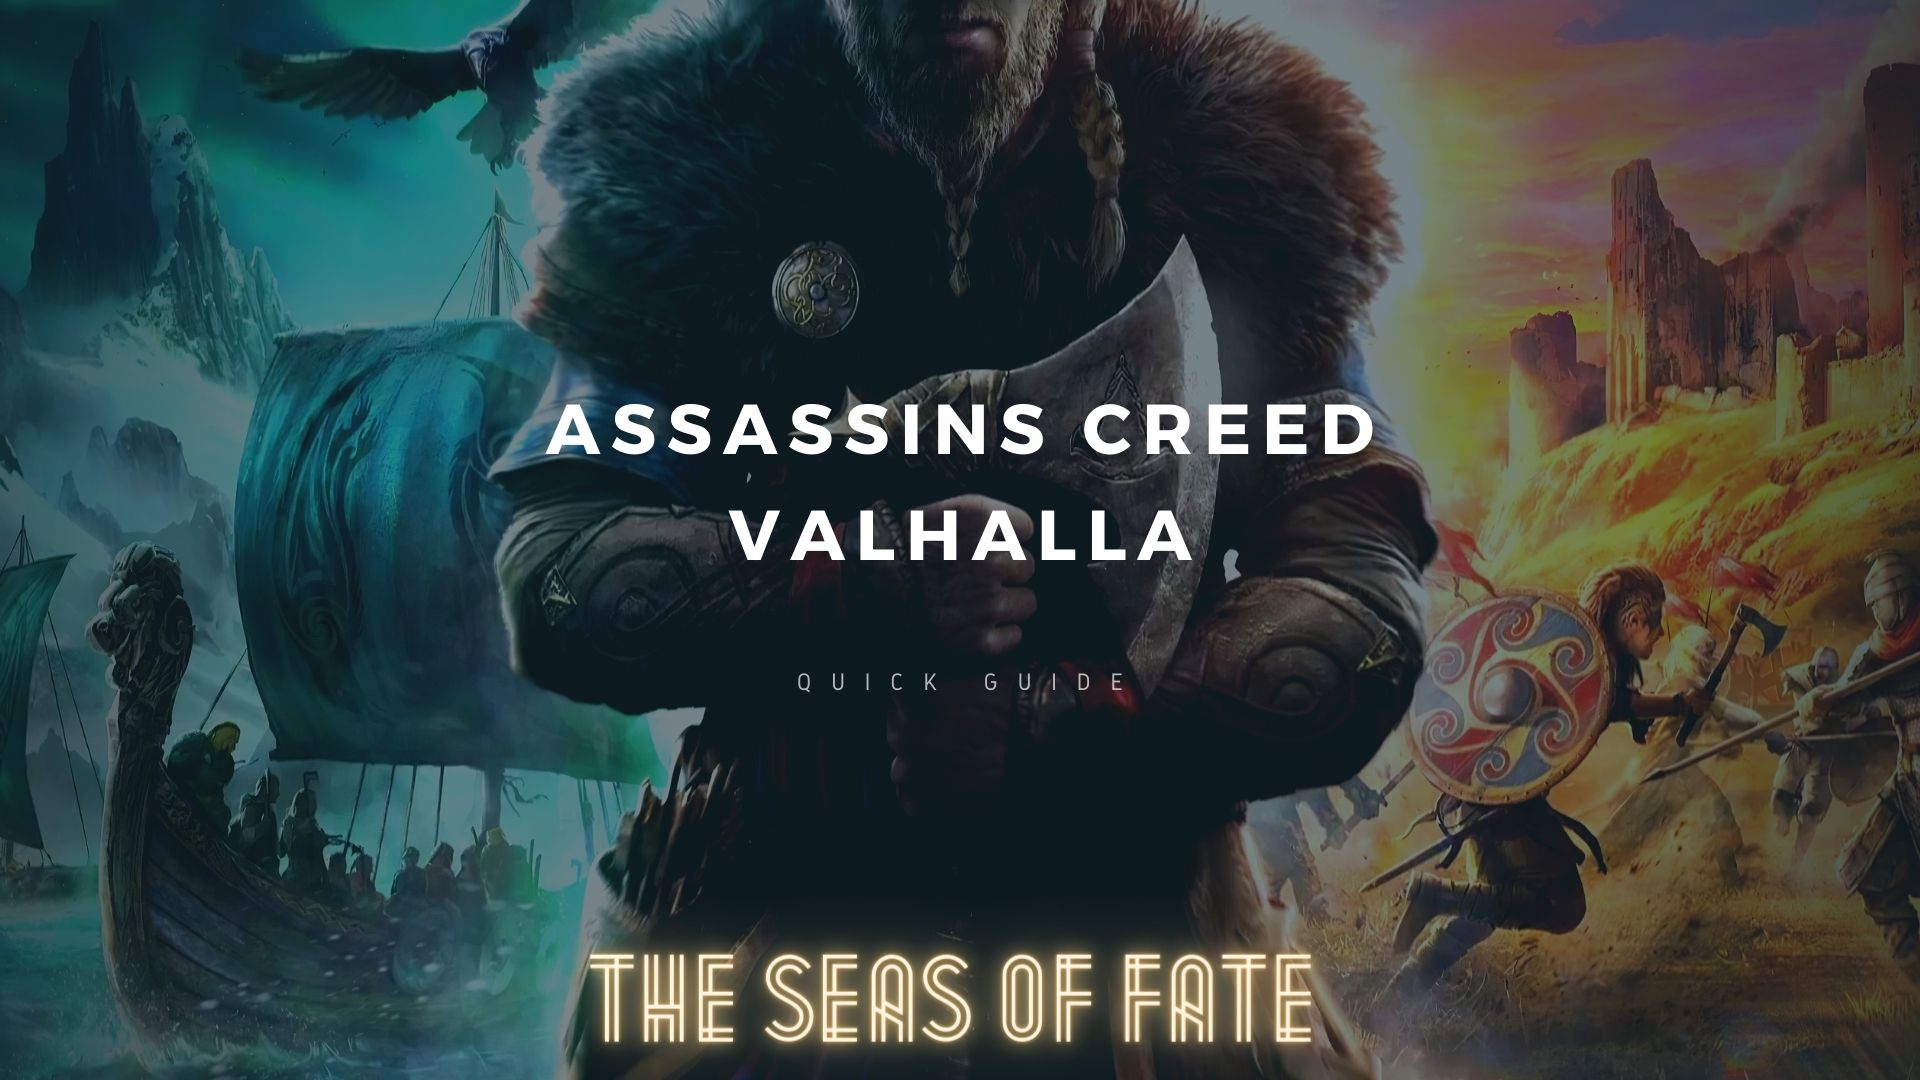 the seas of fate